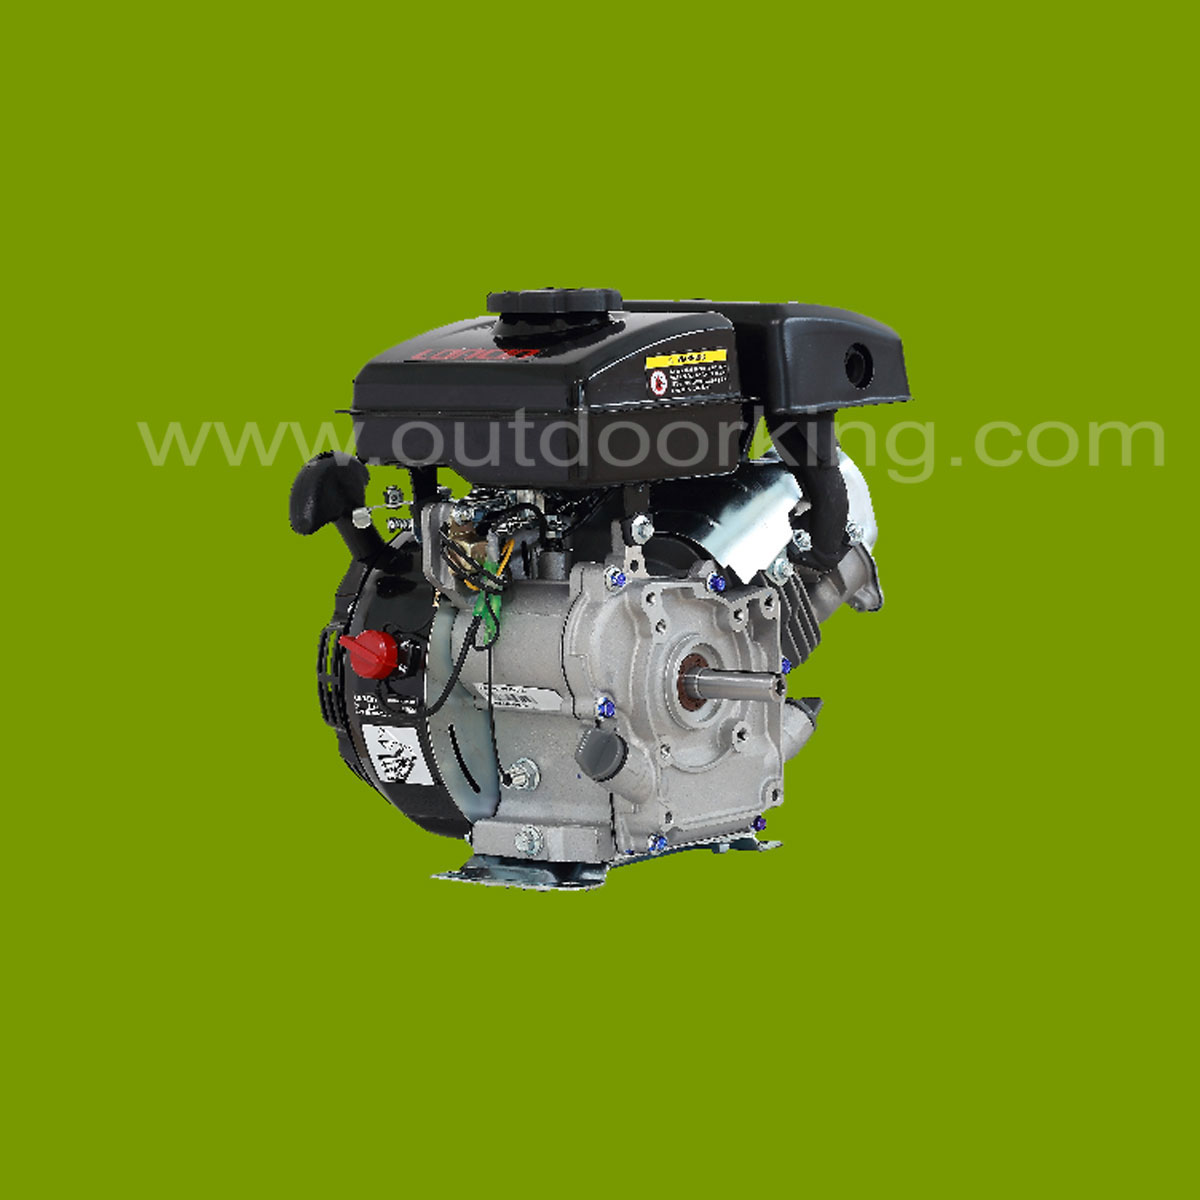 Genuine Loncin Horizontal Engine - Lc154f-1  Lc154f-1